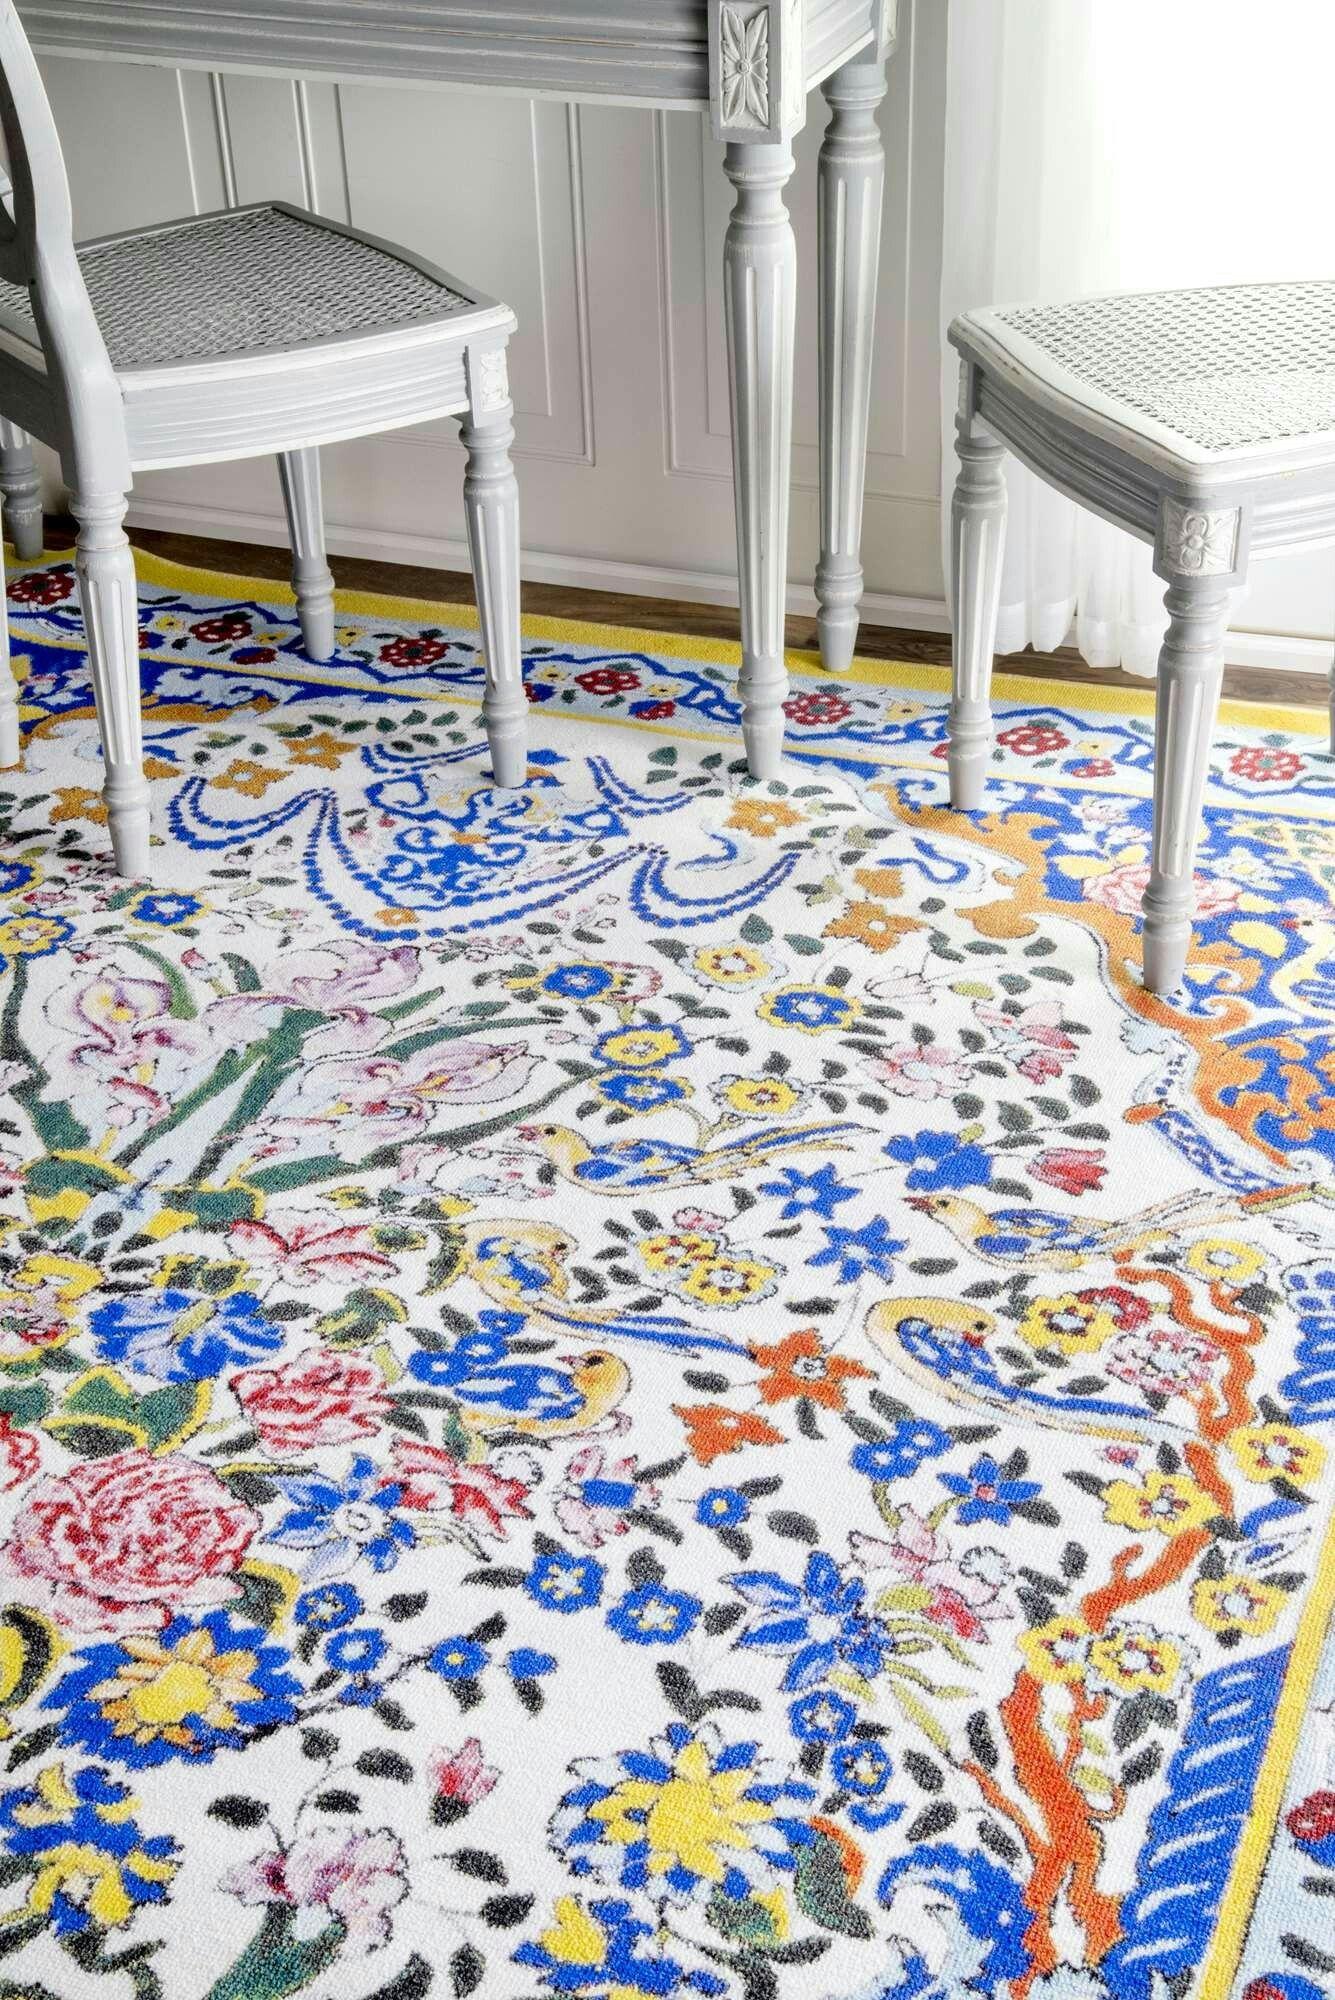 Rugs usa Portuguese Tile | Rug shopping | Pinterest | Portuguese tiles